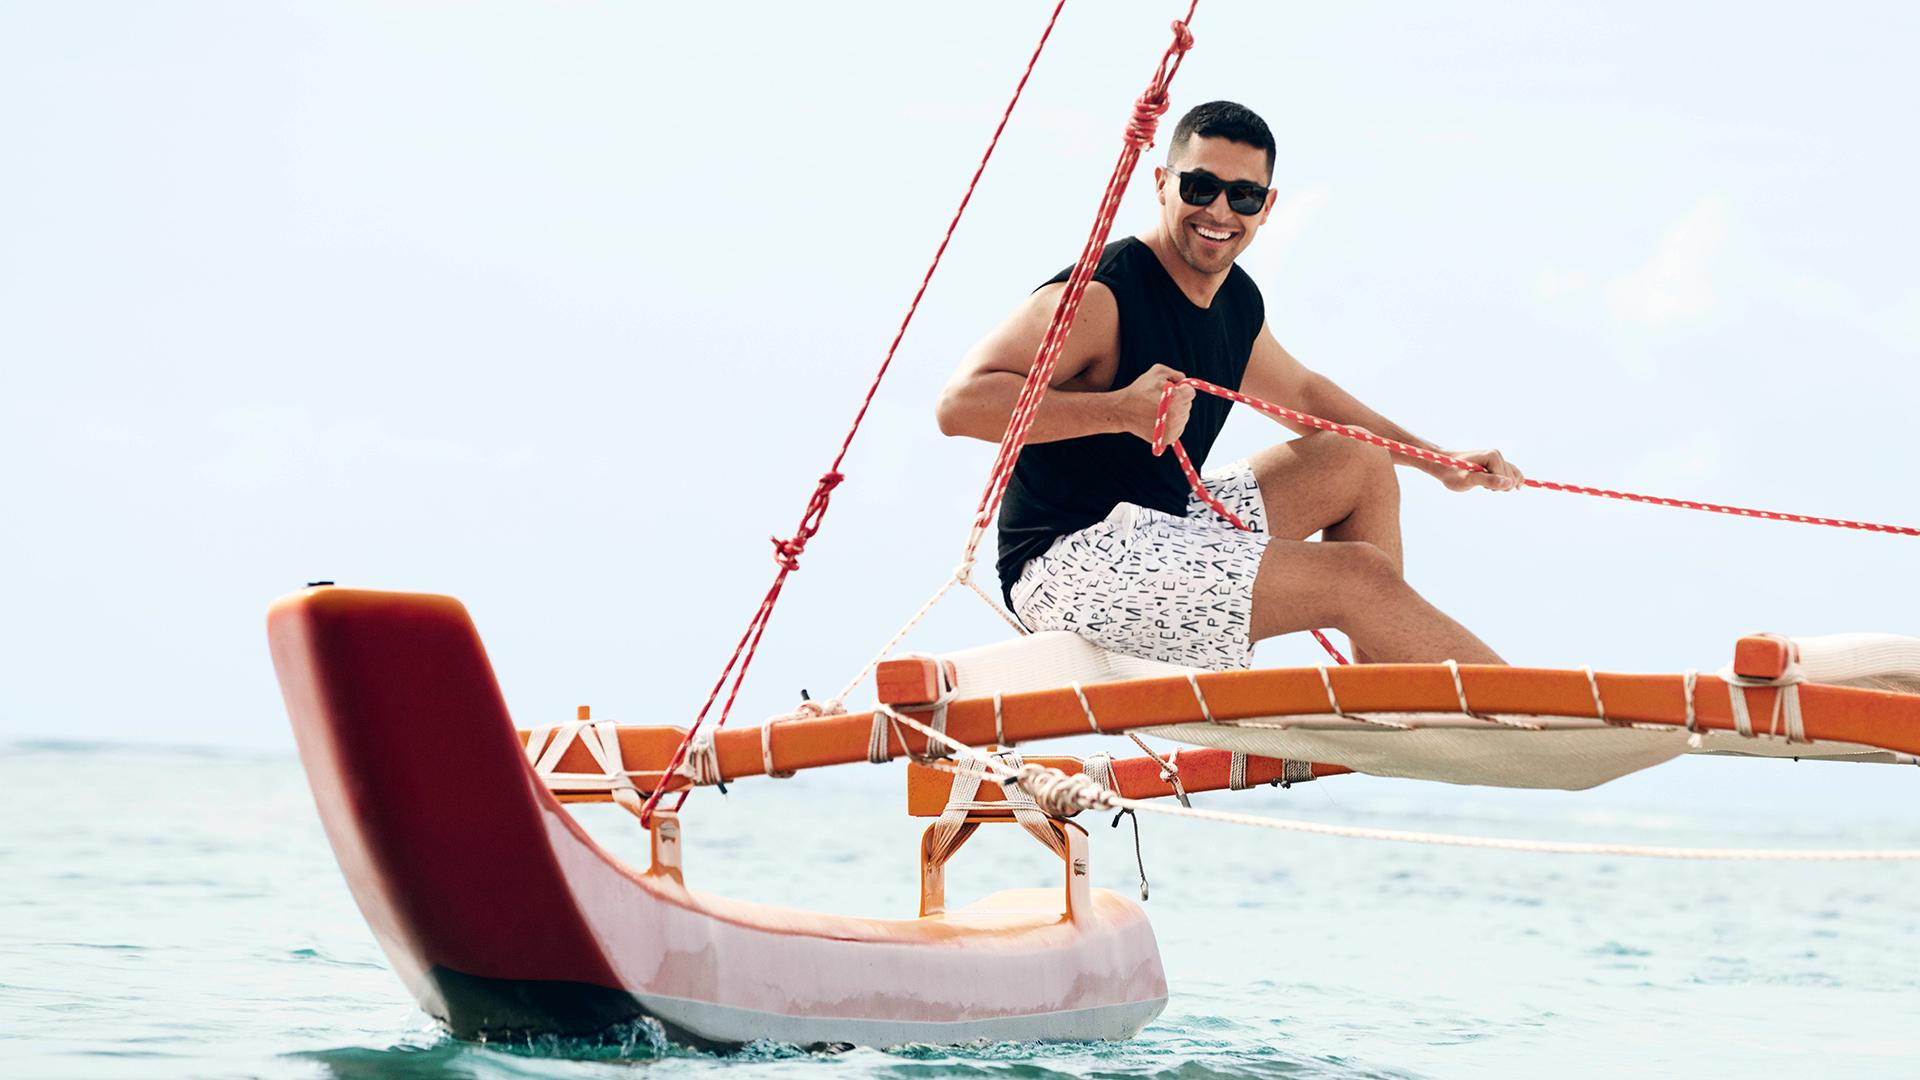 Wilmer Valderrama sailing away